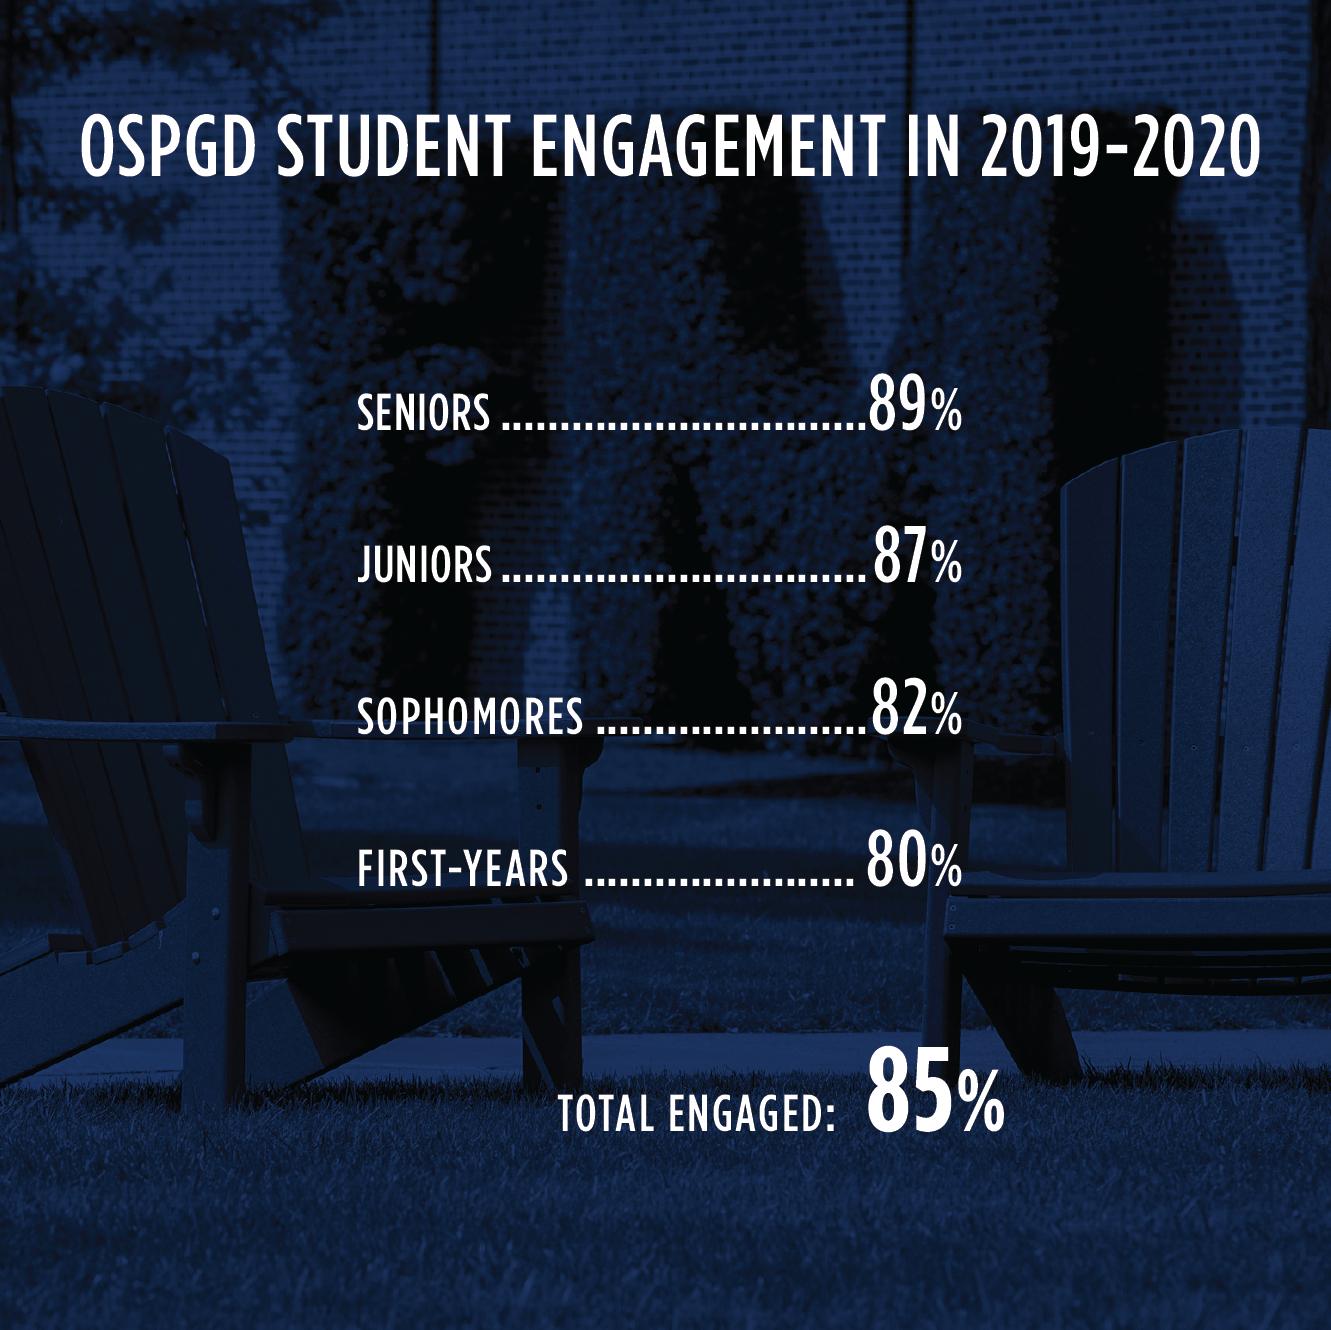 engagement with OSPGD